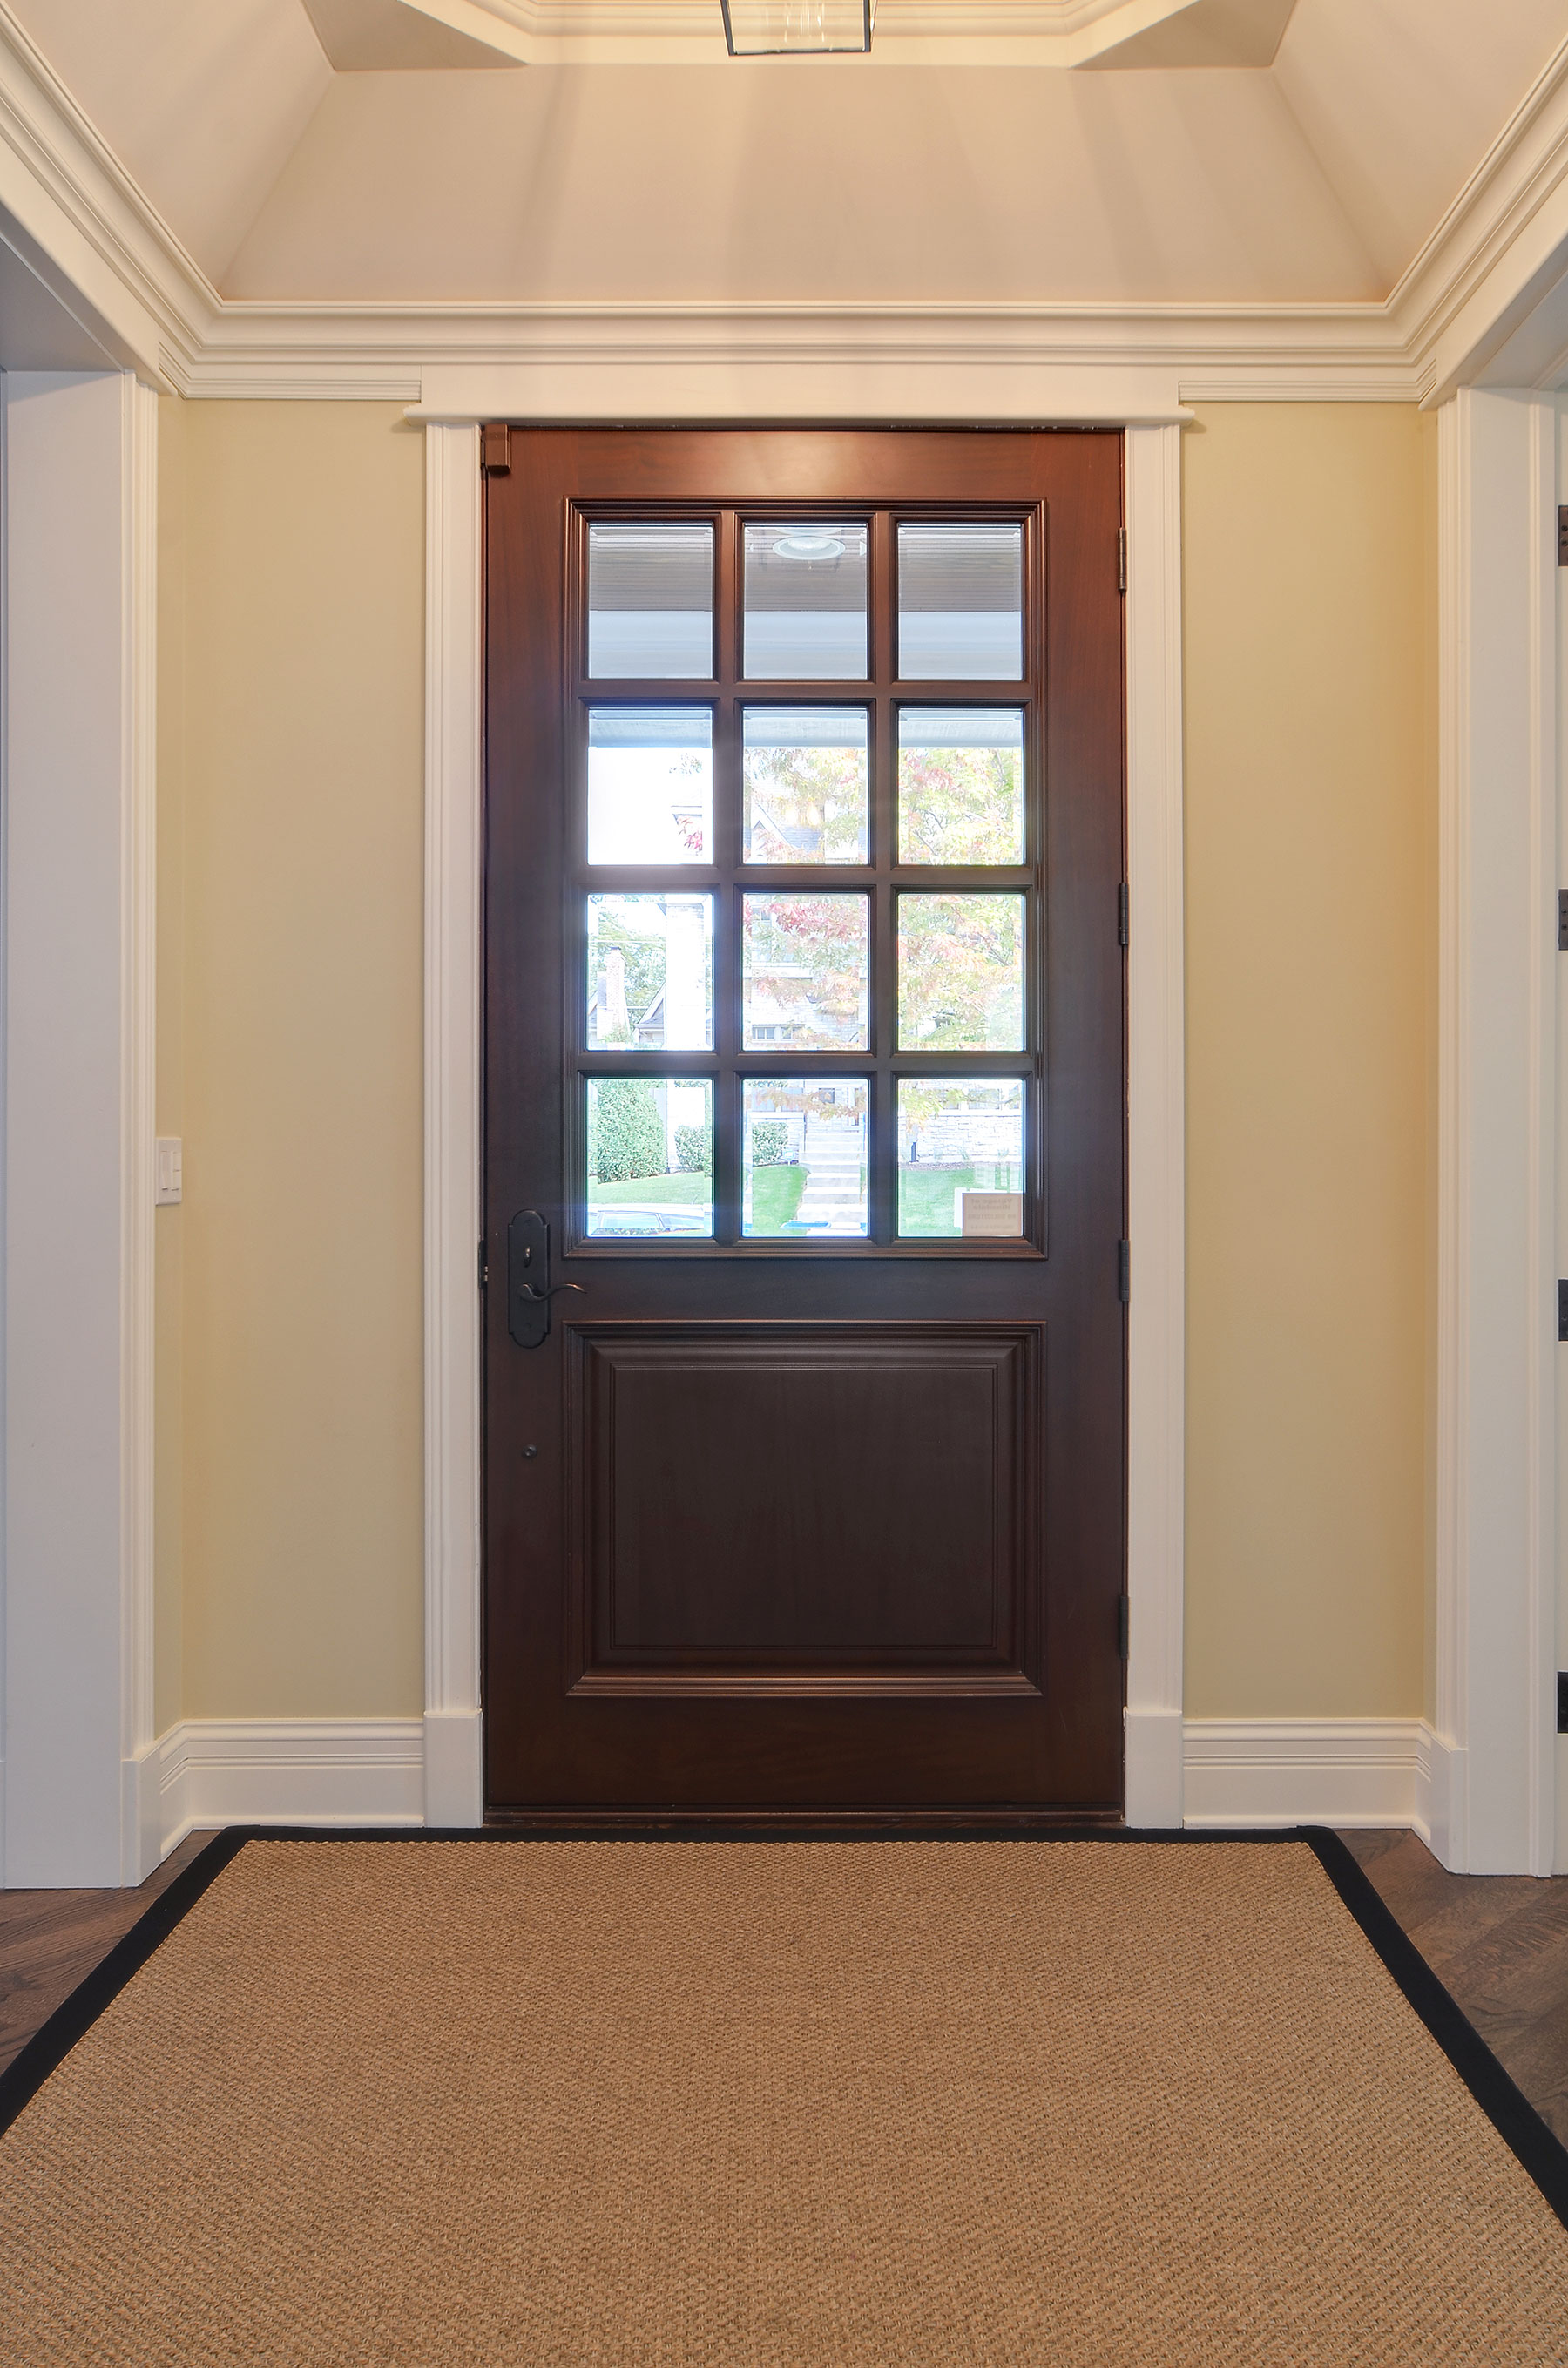 Solid Wood Front Entry Doors in-Stock | solid wood front entry door, clear glass, 12 lite DB-012W - Glenview Doors - Custom Doors in Chicago